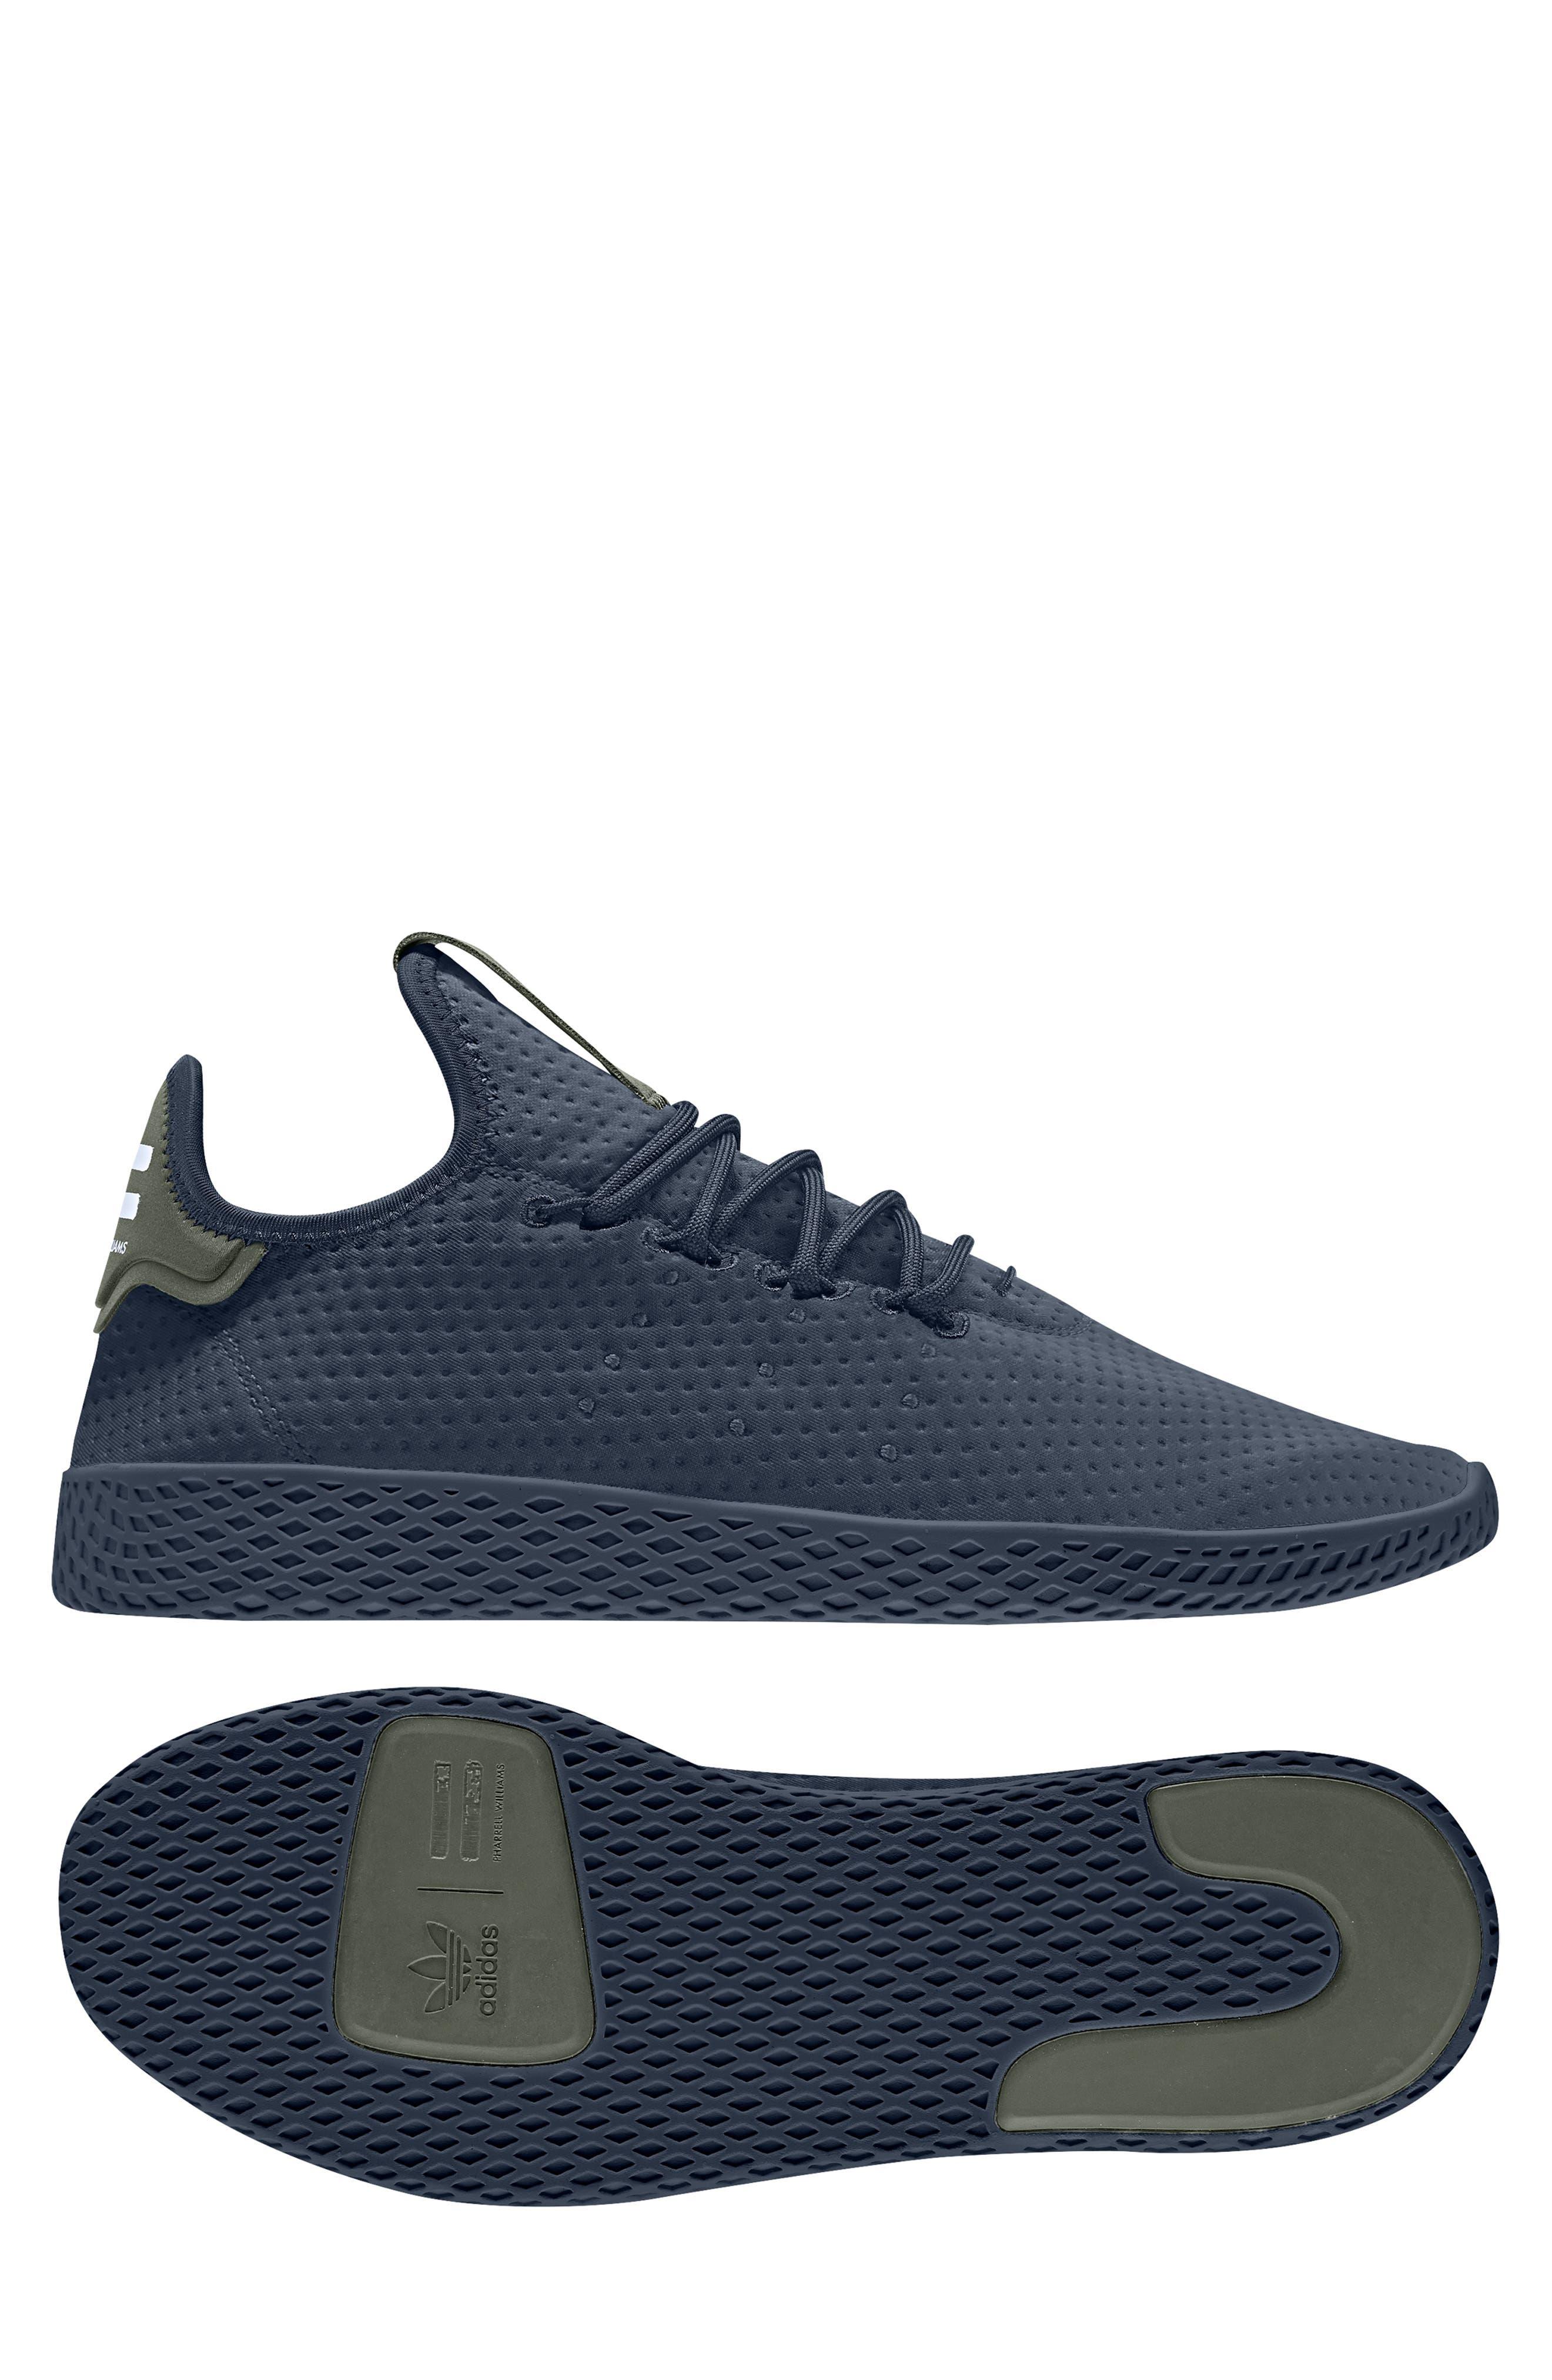 Pharrell Williams Tennis Hu Sneaker,                             Alternate thumbnail 10, color,                             415